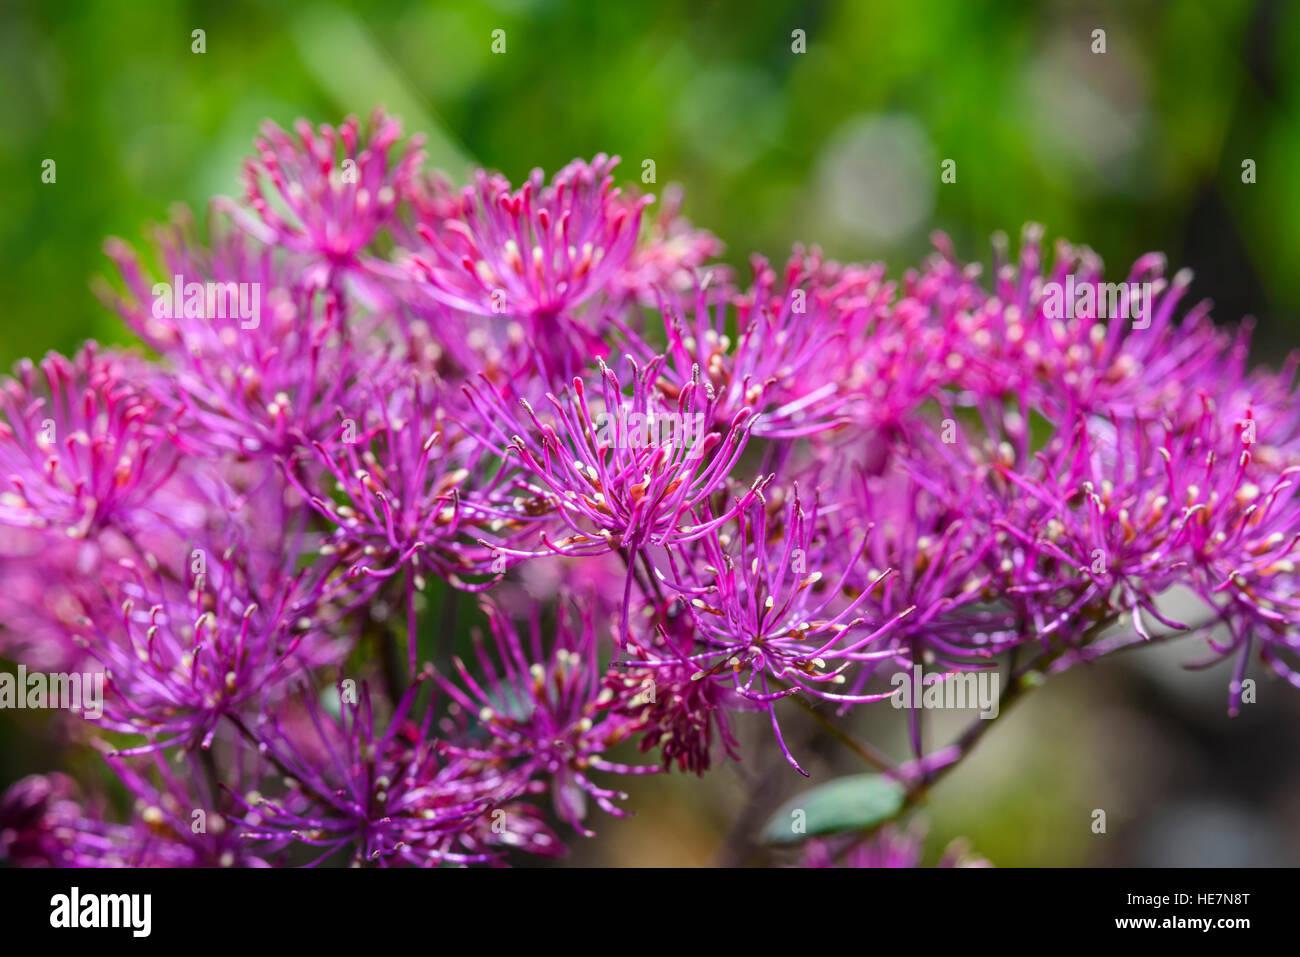 Thalictrum aquilegiifolium Small Thunder Cloud, cultivated garden flower - Stock Image